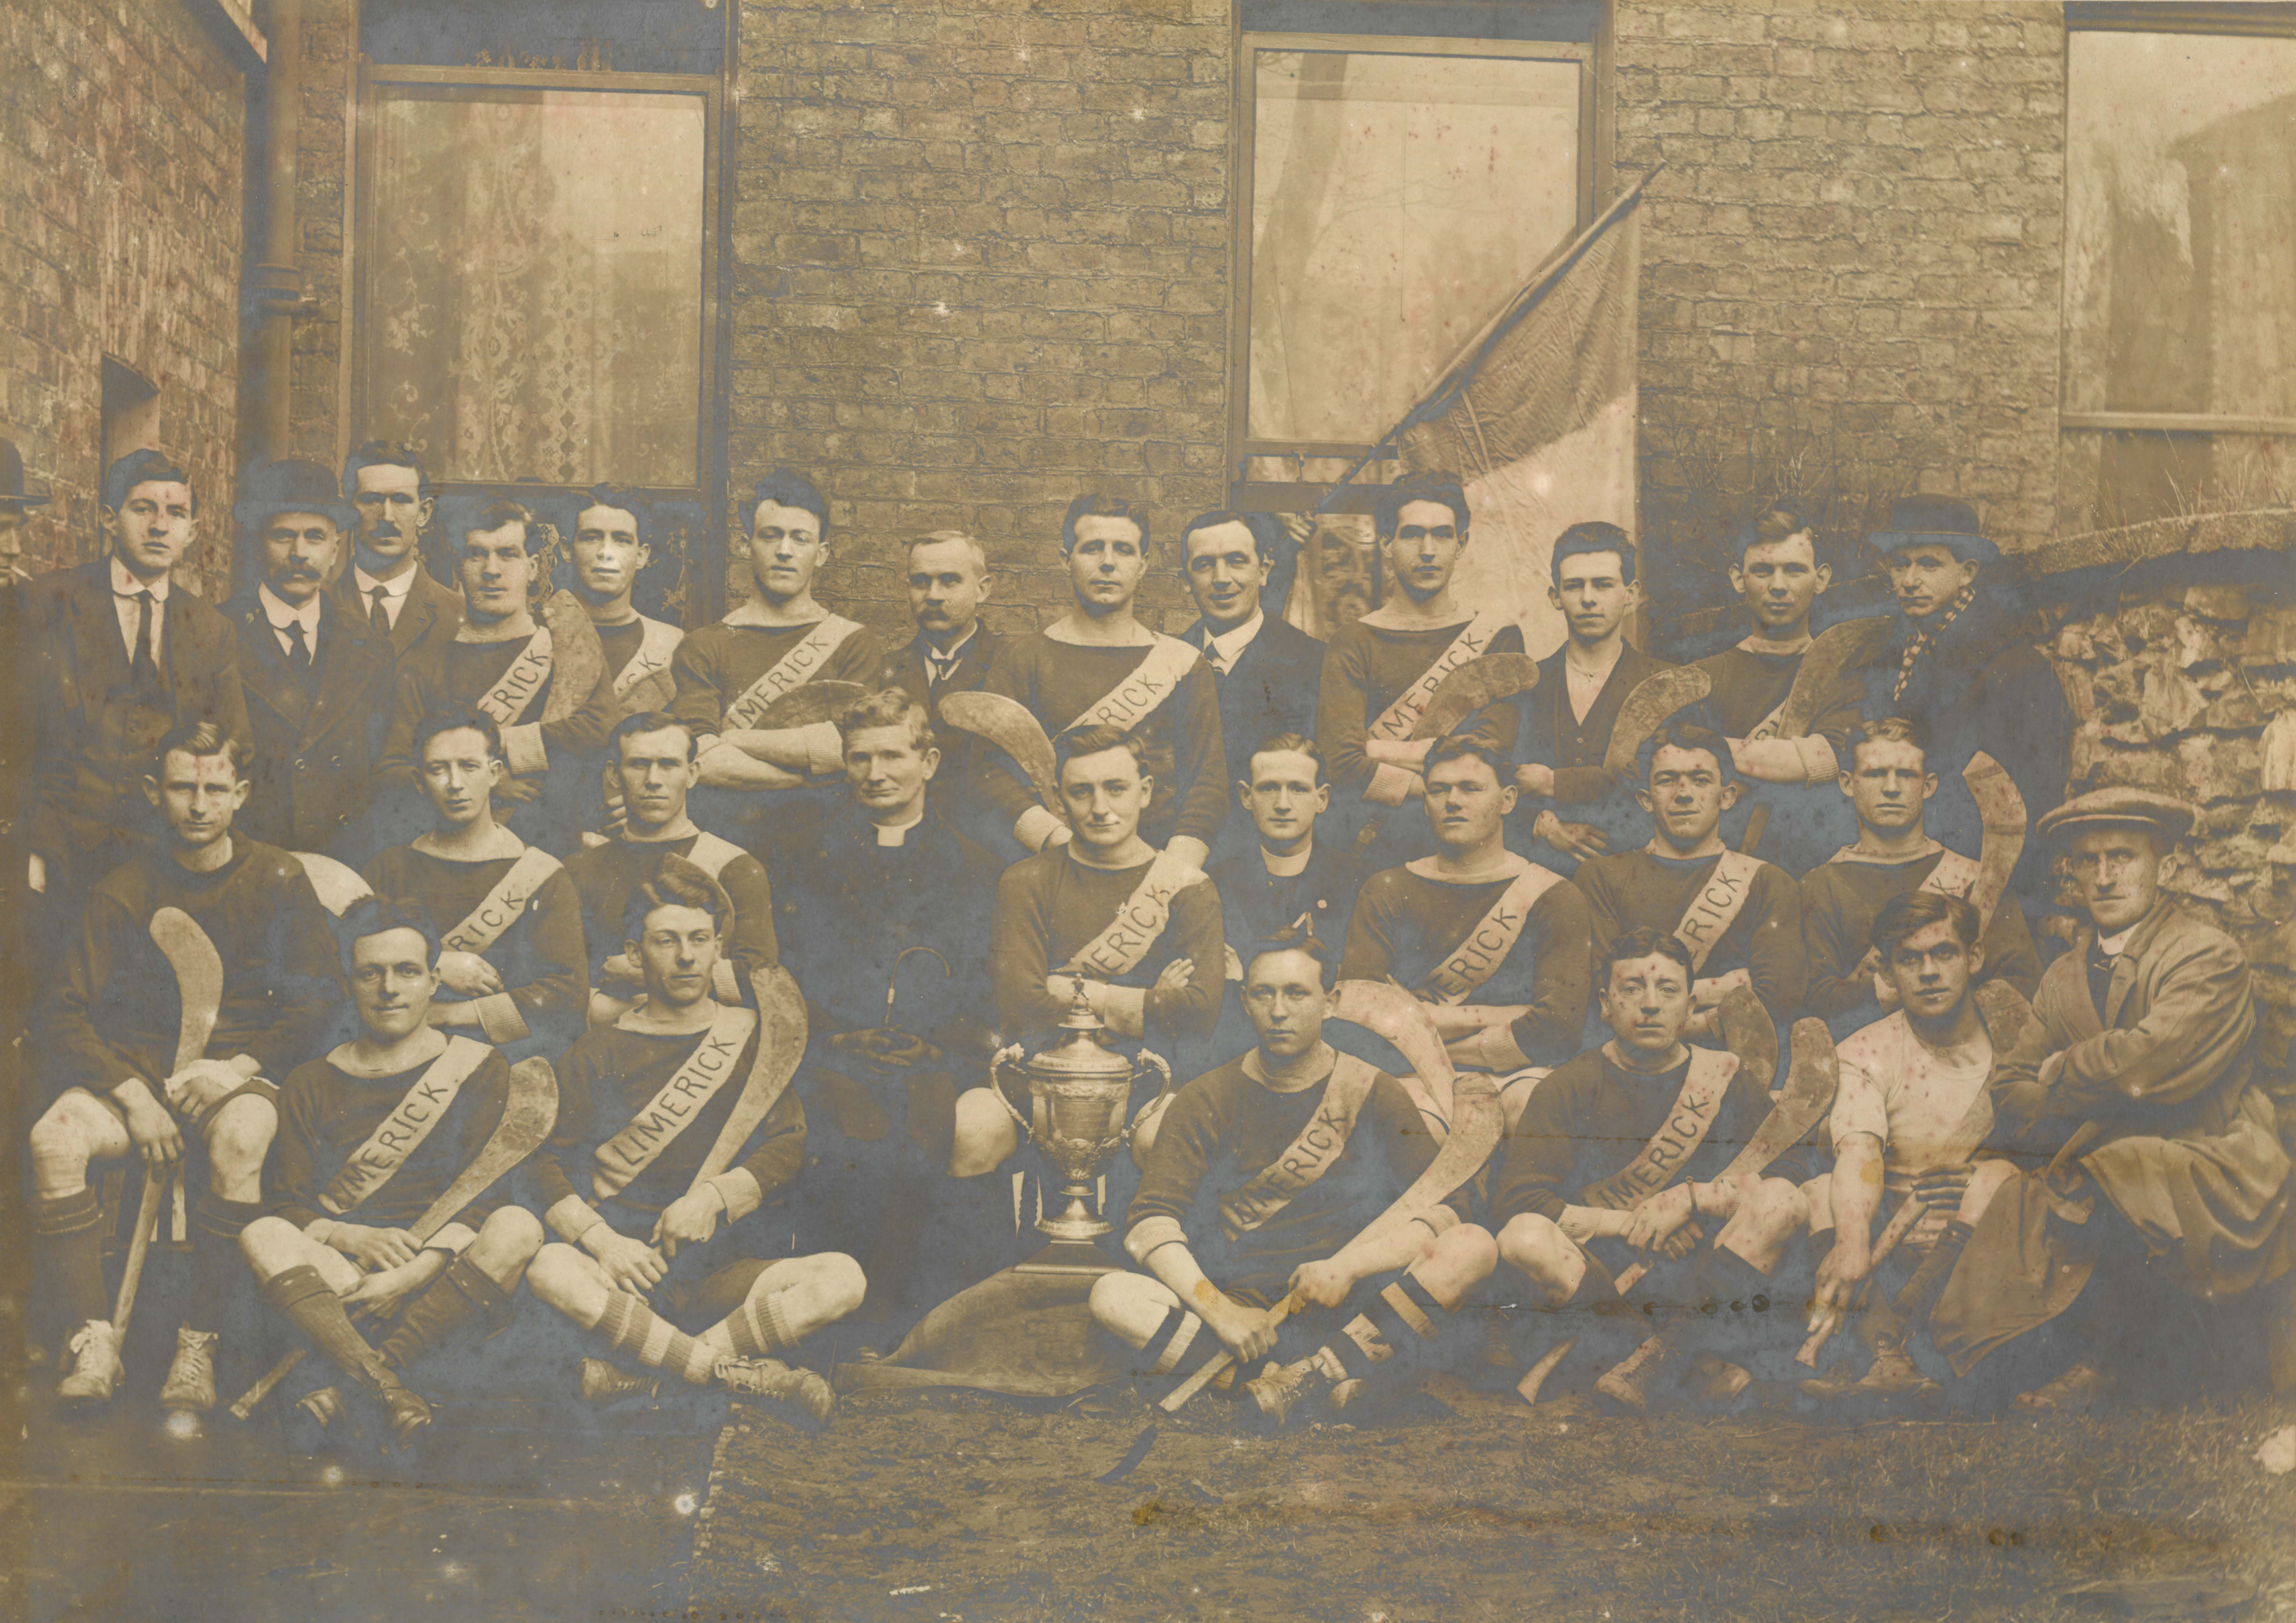 Limerick (Newcastle West) 1918 Hurling All-Ireland Champions